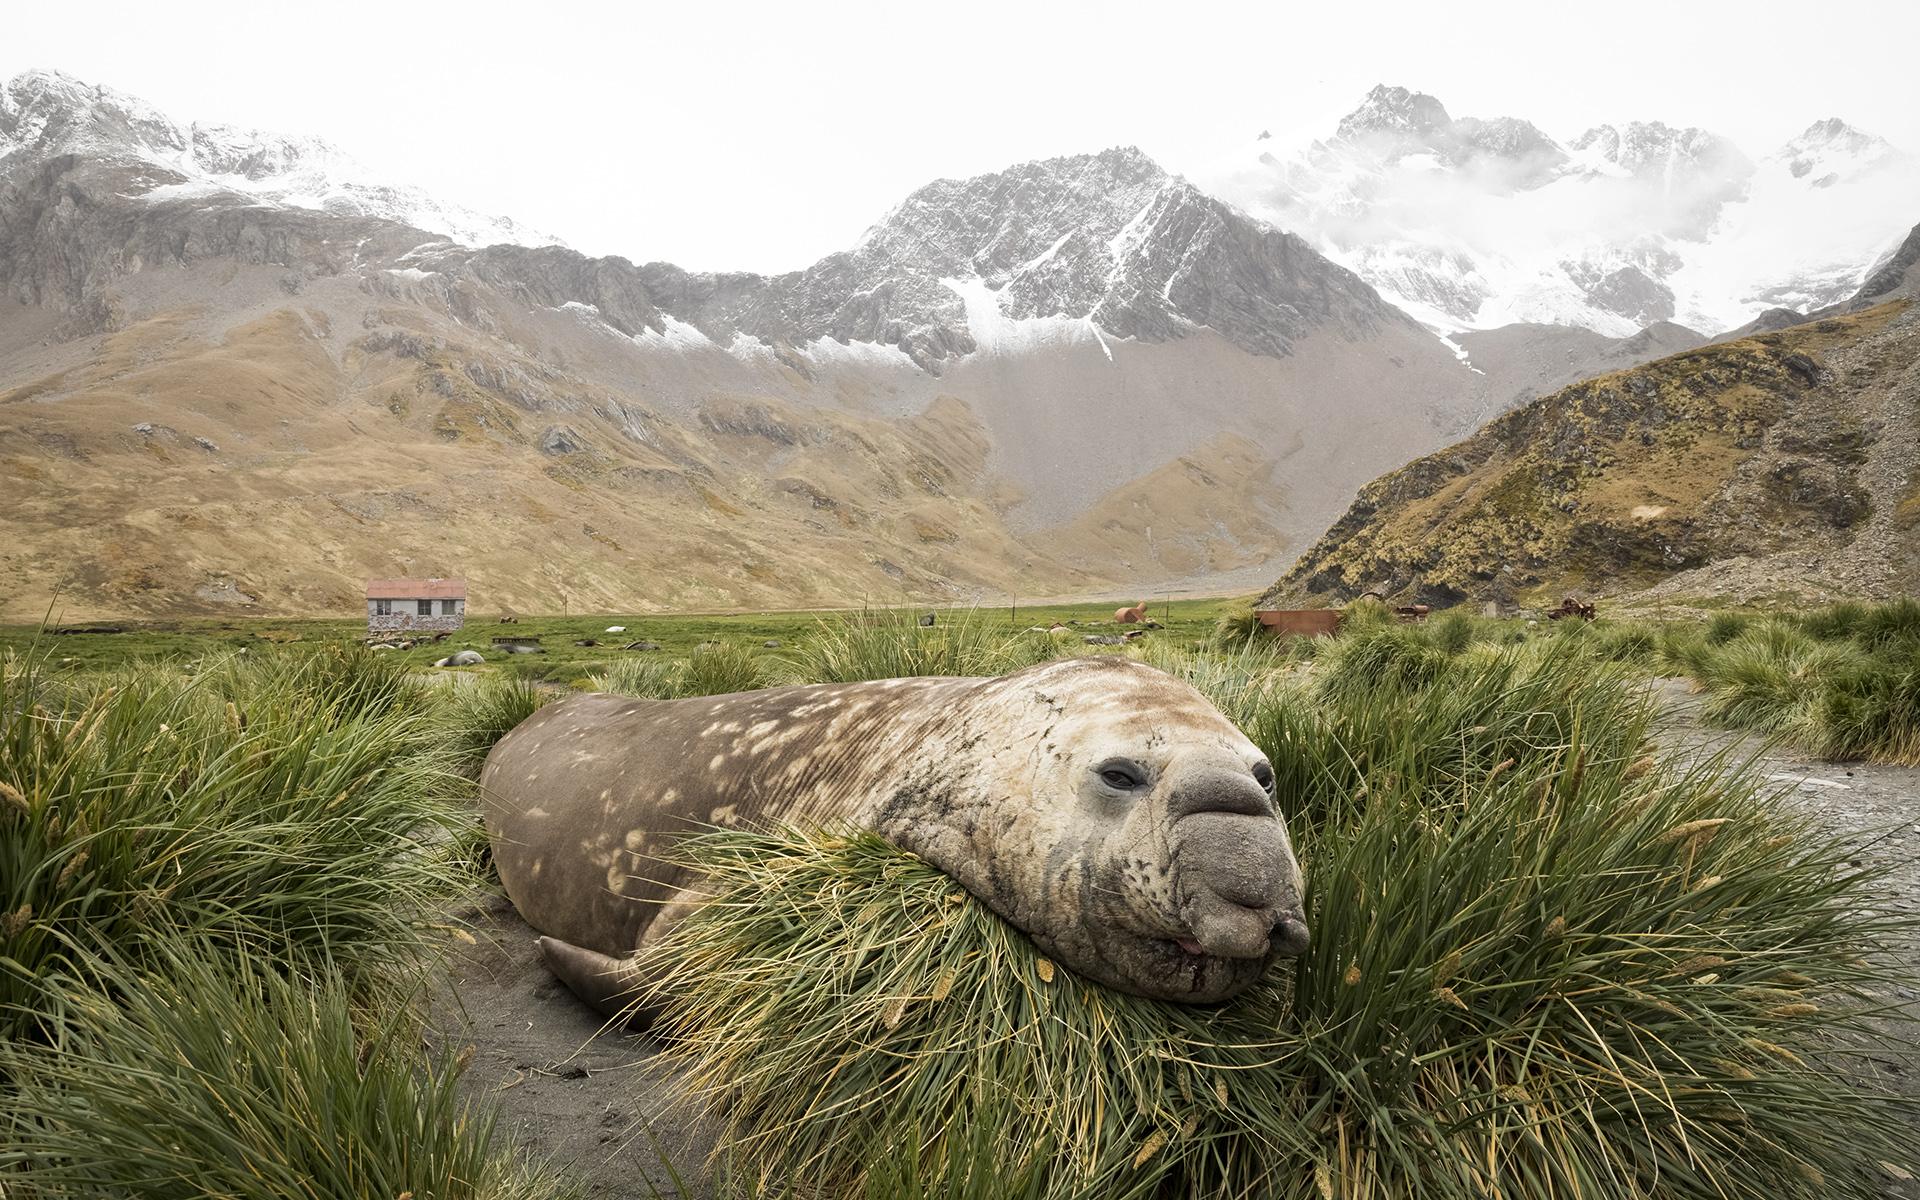 Brian_Jones_Elephant Seal in Tussock Grass.jpg